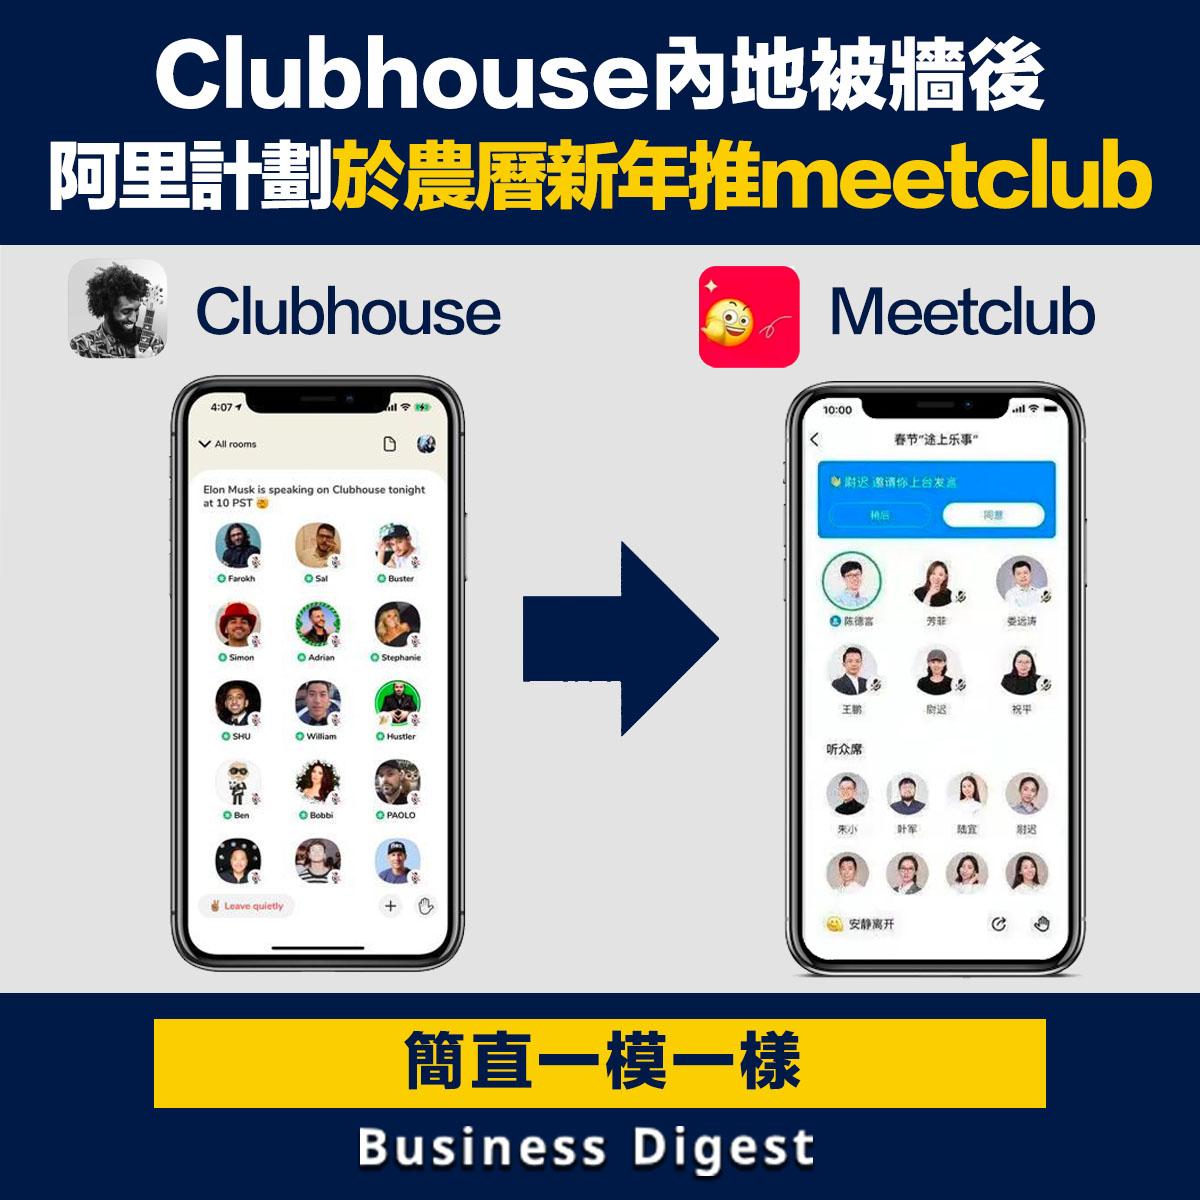 Clubhouse內地被牆後,阿里計劃於農曆新年推meetclub